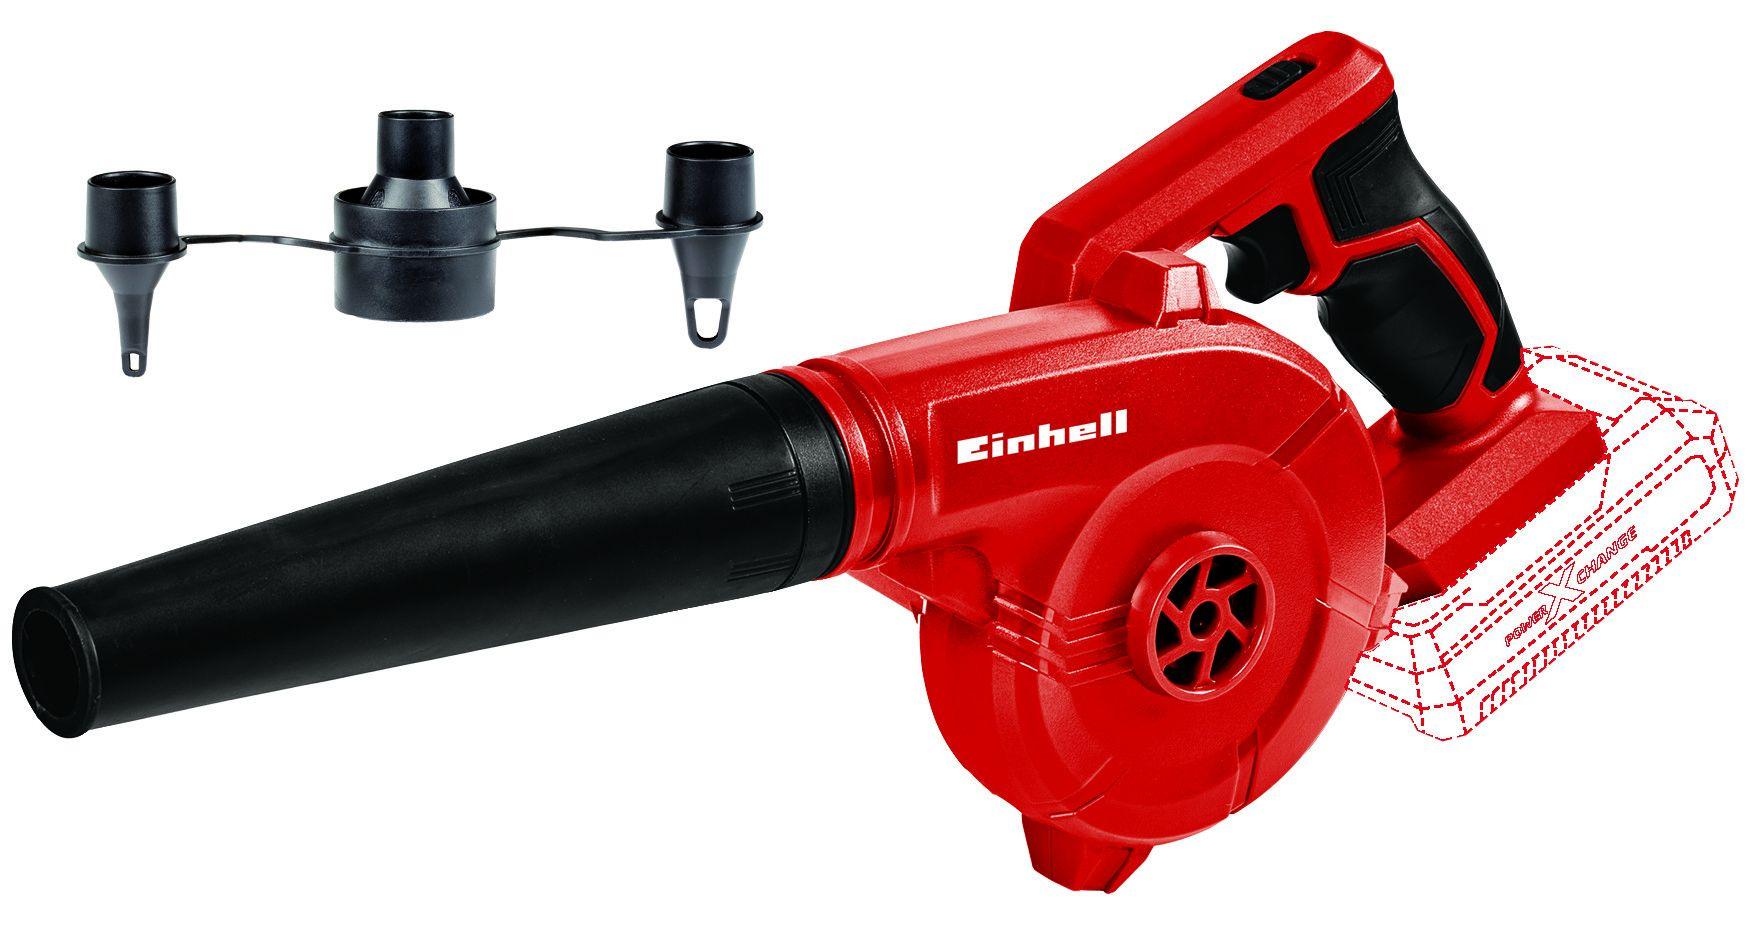 Soffiatore a batteria TE-CB 18/180 Li Solo, 18 V Einhell 3408001